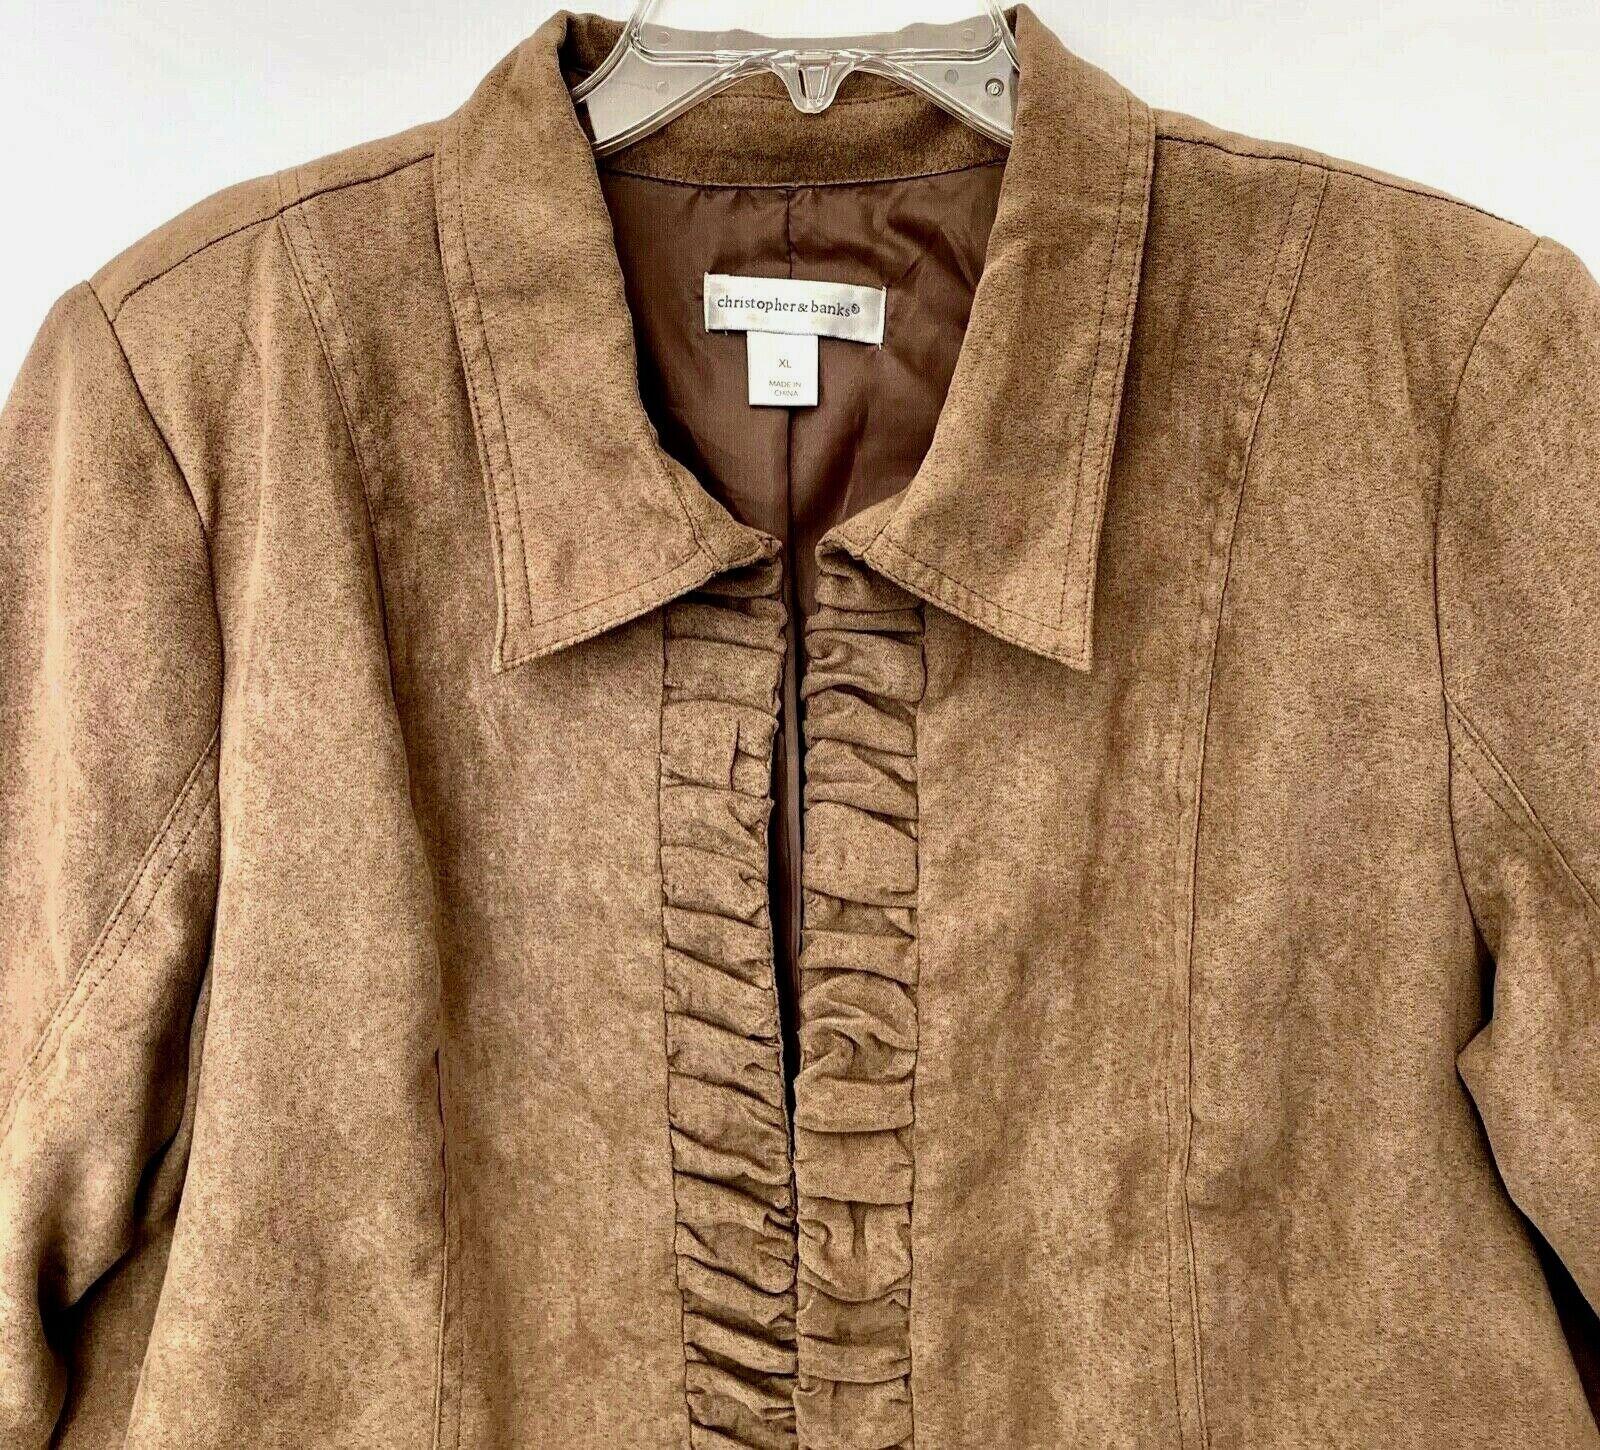 Christopher & Banks Open Lined Jacket Women's XL 3/4 Sleeve Tan Collar